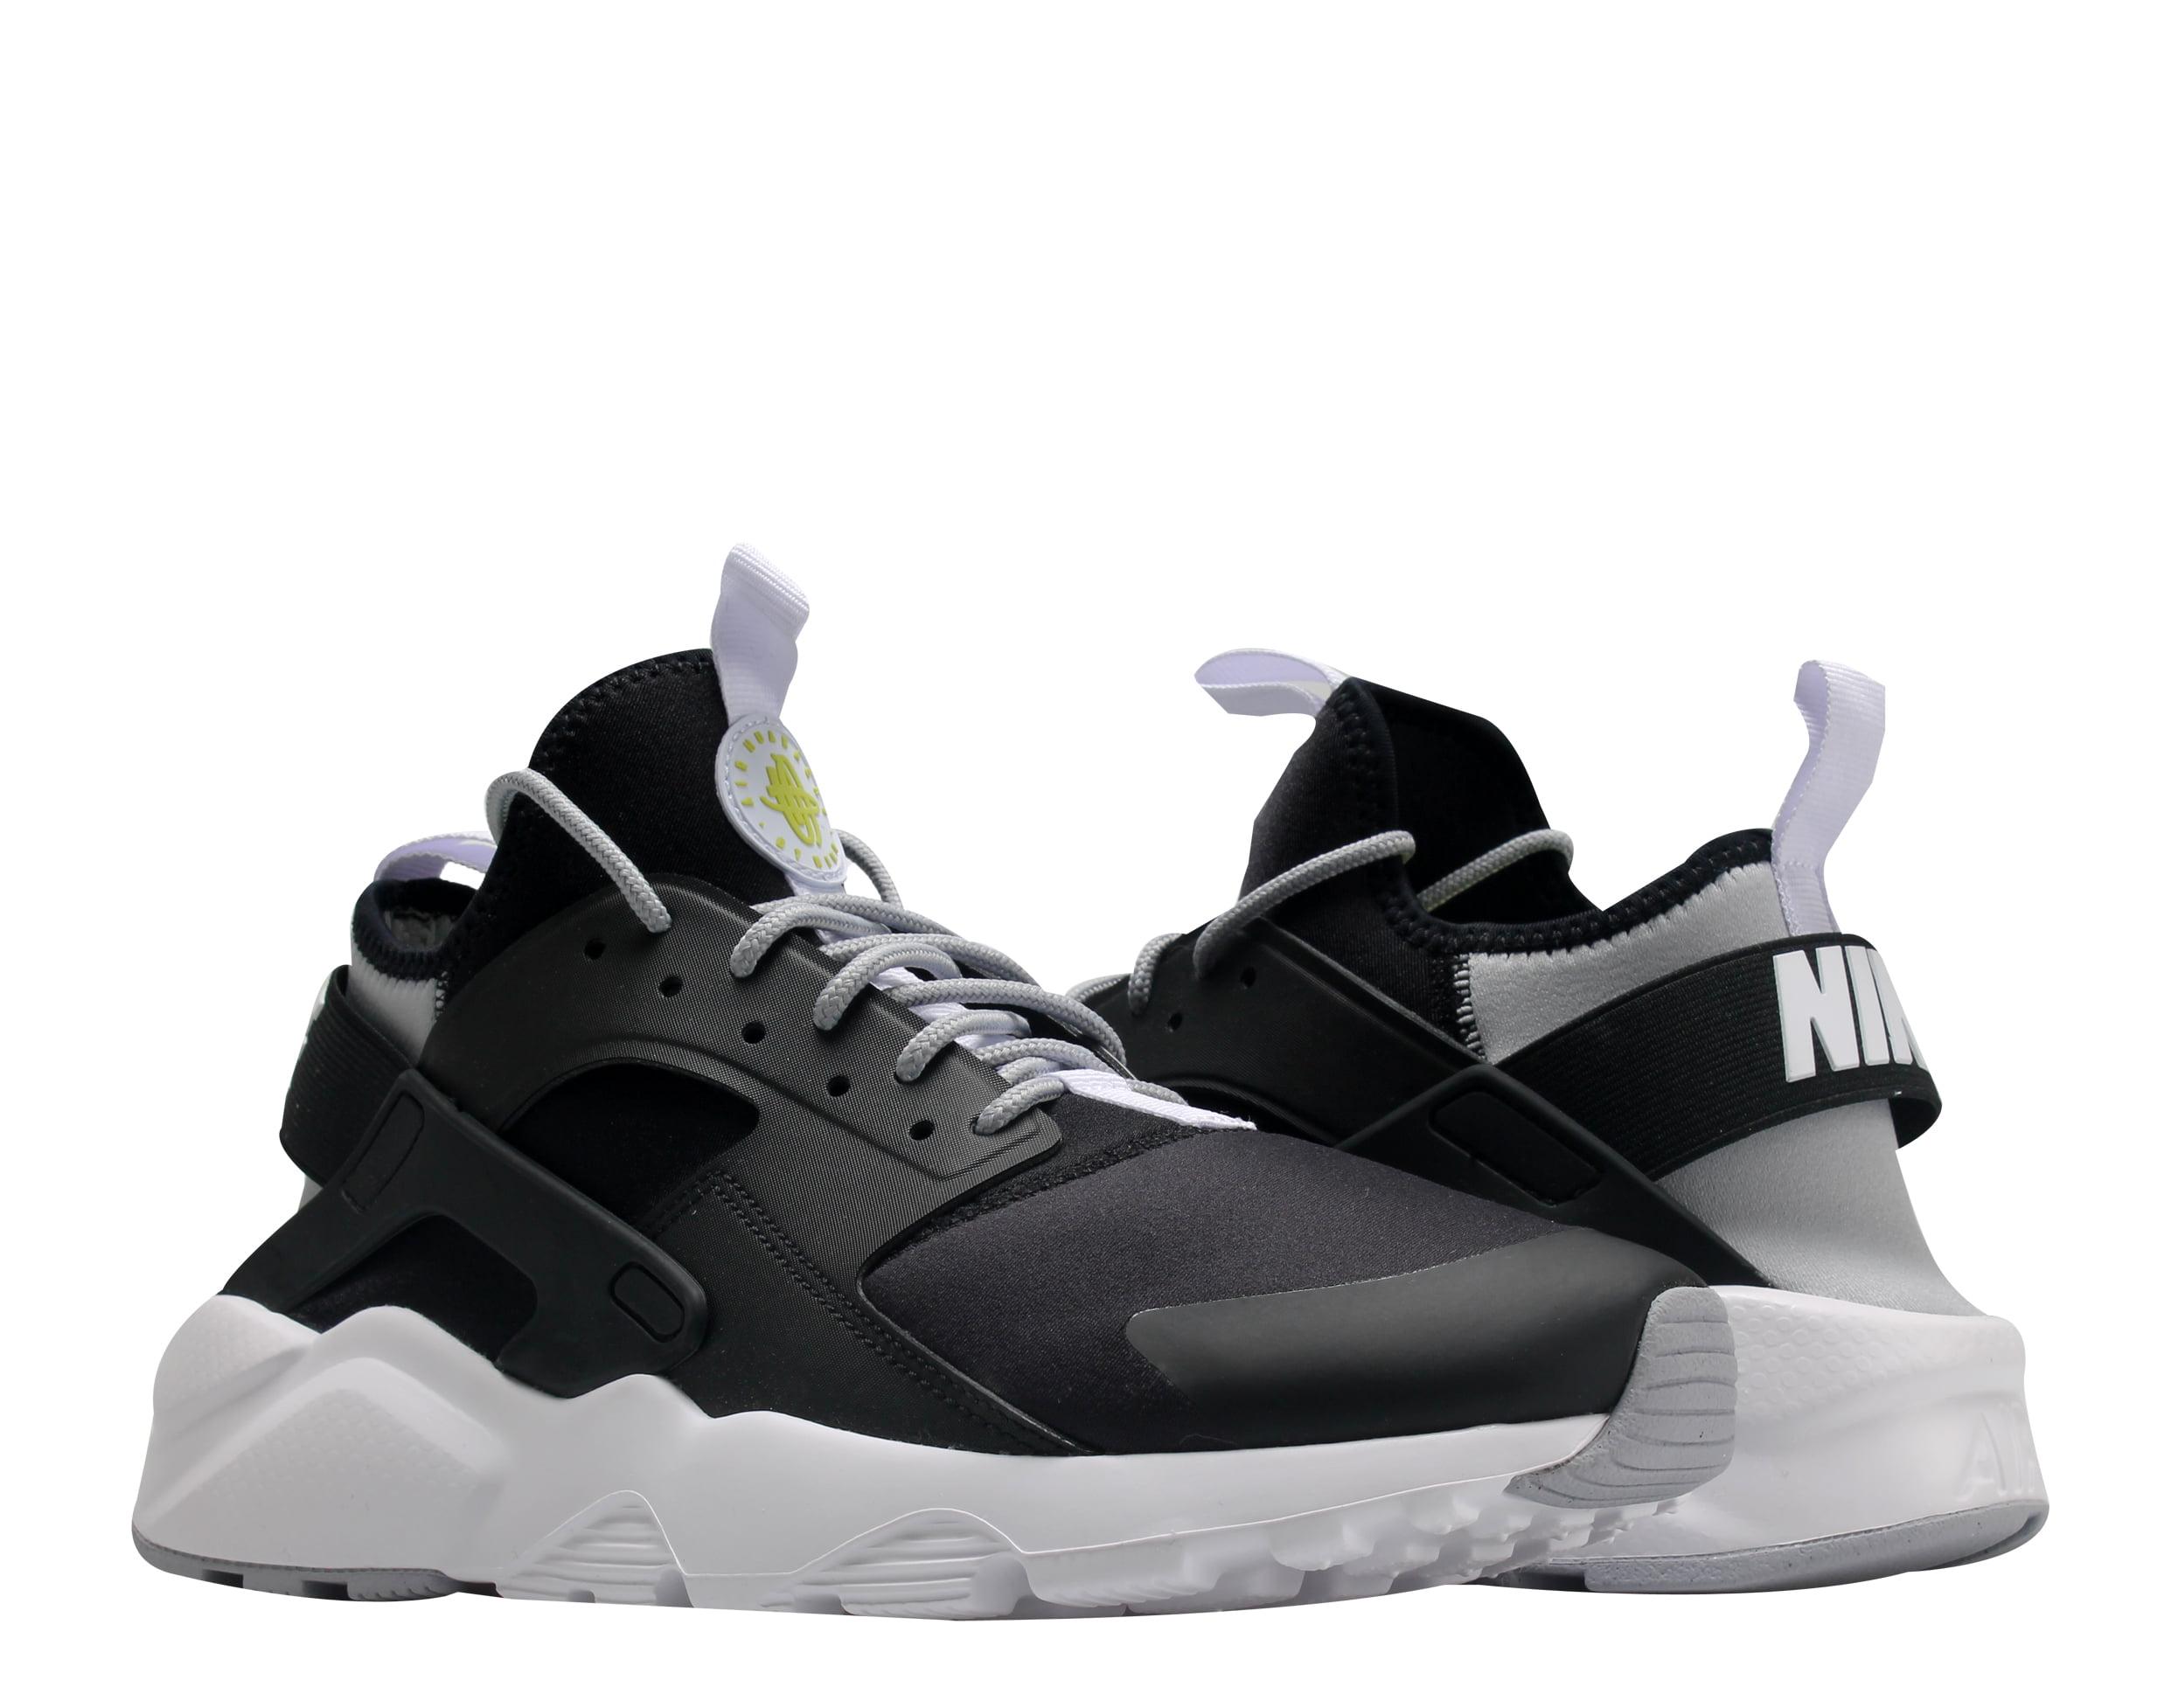 Nike Air Huarache Run Ultra Black/White-Grey Men's Running Shoes 819685-014